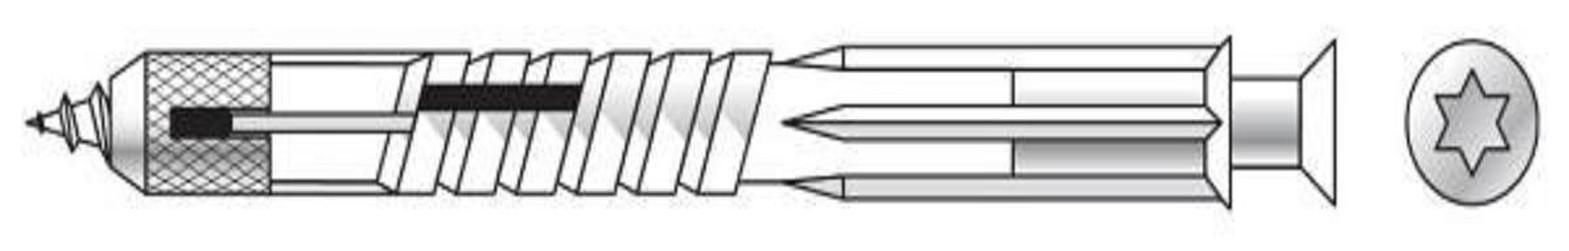 hmoždinka 10x100 6hr VLF plynosilikát